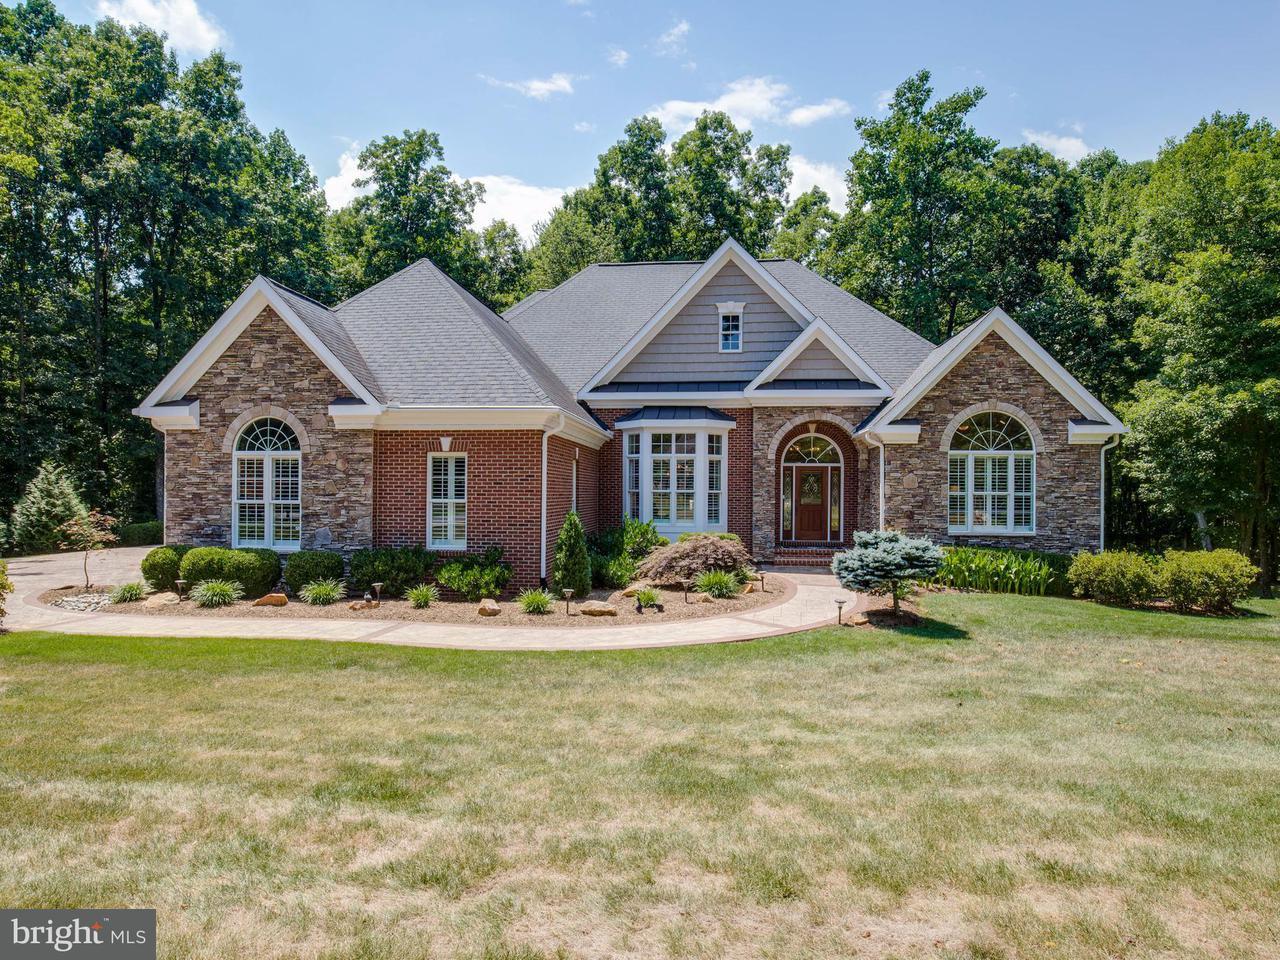 Single Family Home for Sale at 15198 Rillhurst Drive 15198 Rillhurst Drive Culpeper, Virginia 22701 United States